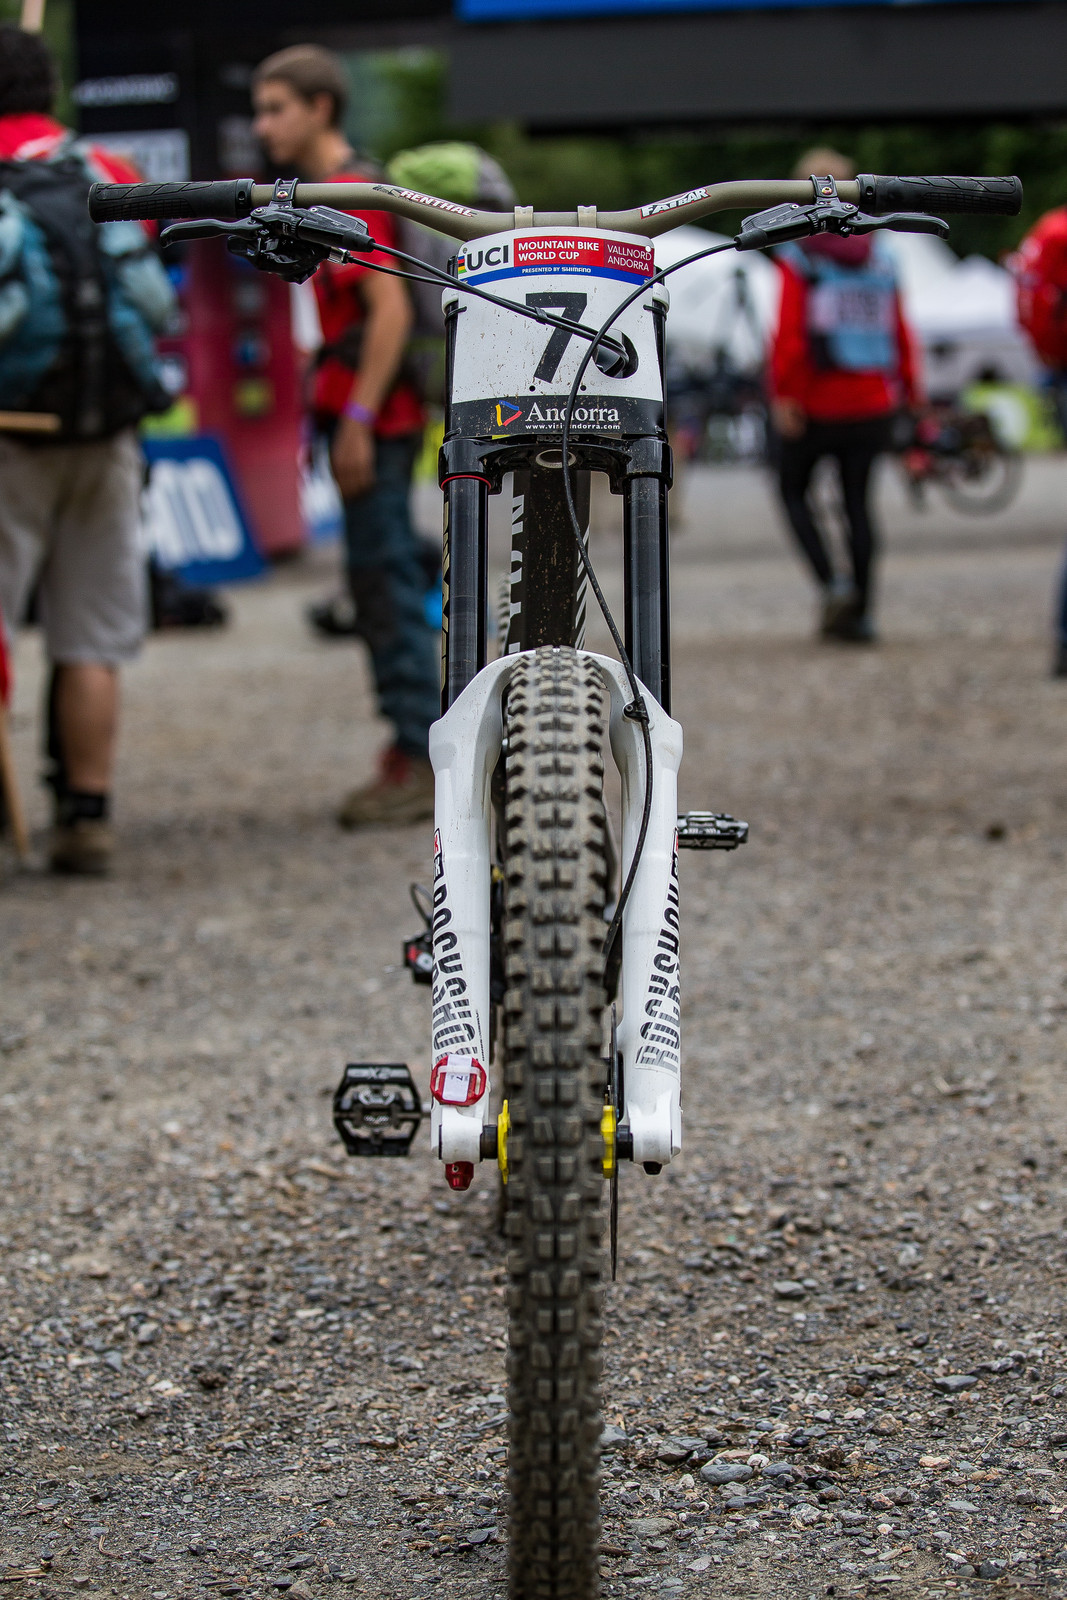 Watch That Plate Number Go Down - WINNING BIKE: Troy Brosnan's Canyon Sender - Mountain Biking Pictures - Vital MTB